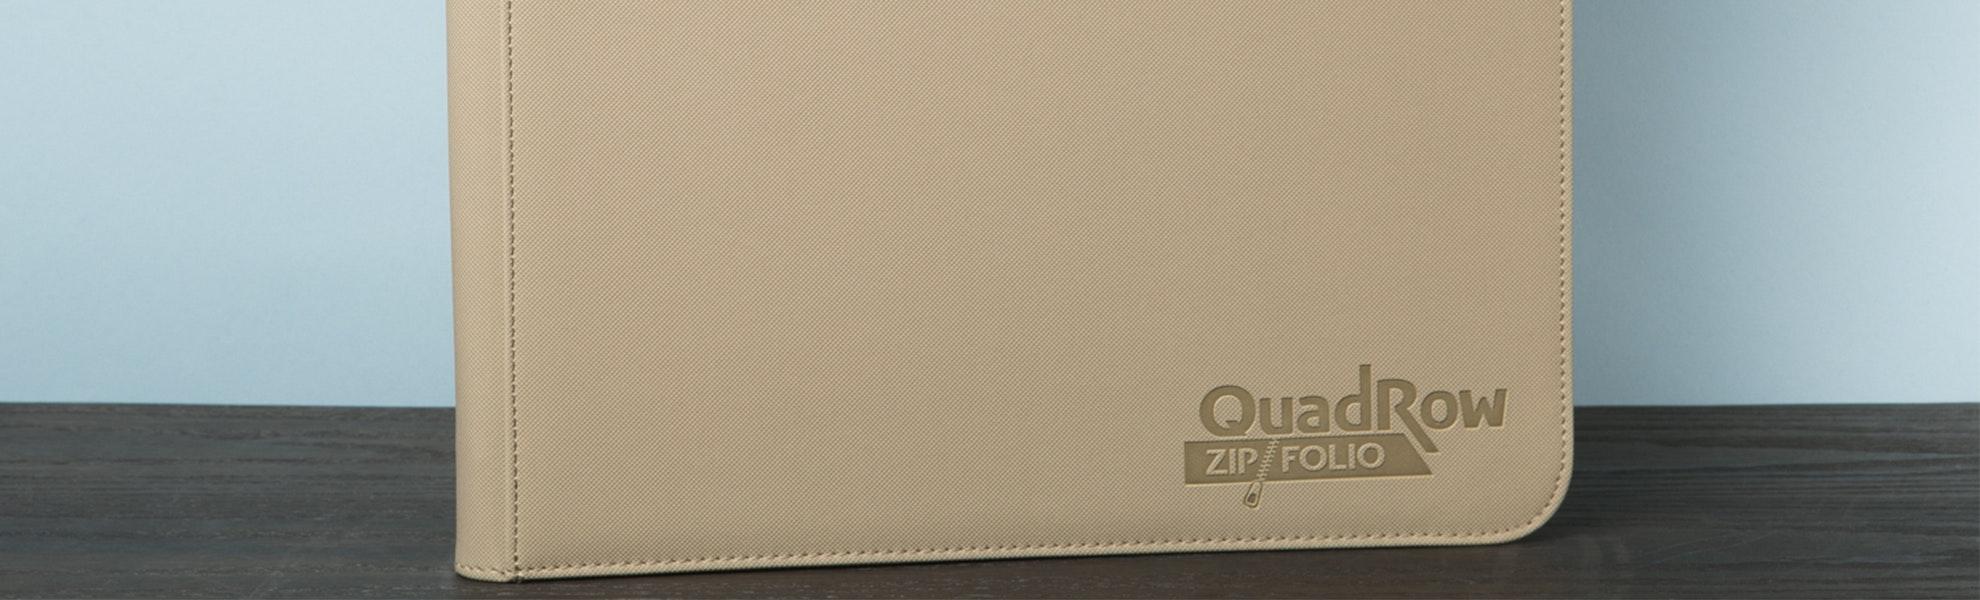 Ultimate Guard QuadRow Zipfolio